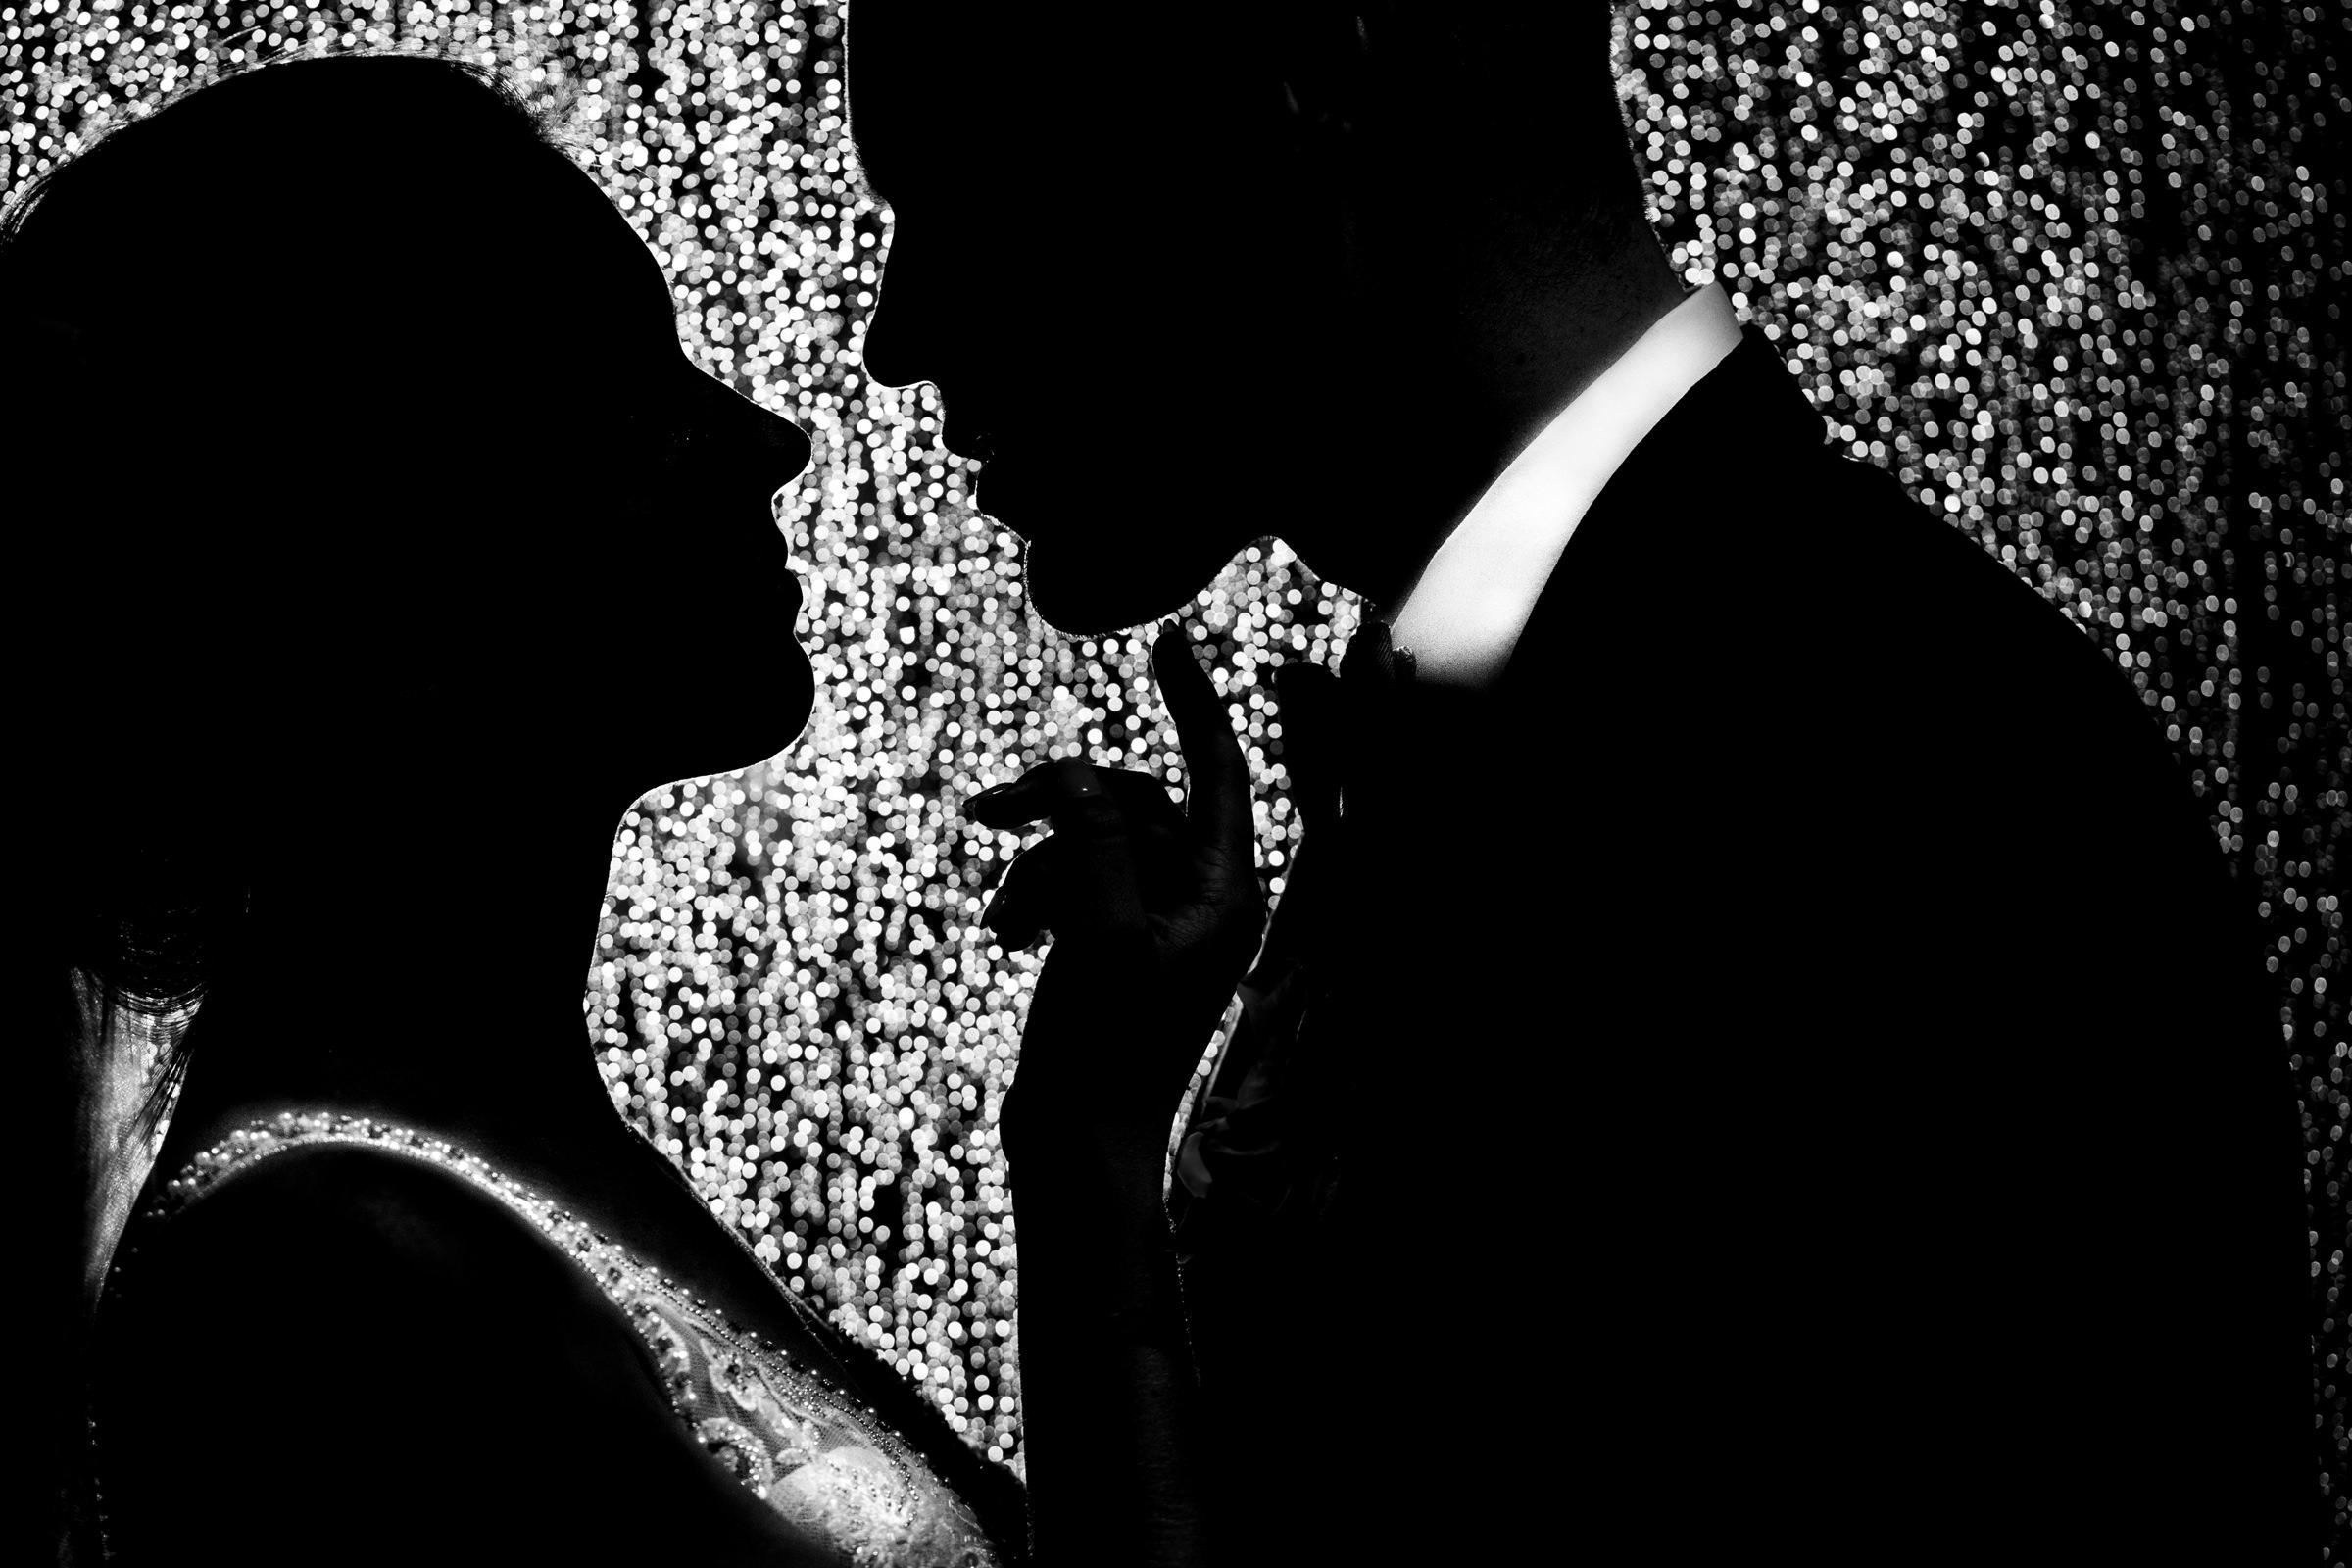 bride and groom silhouette portrait-Arkansas photographer- photo by Vinson Images